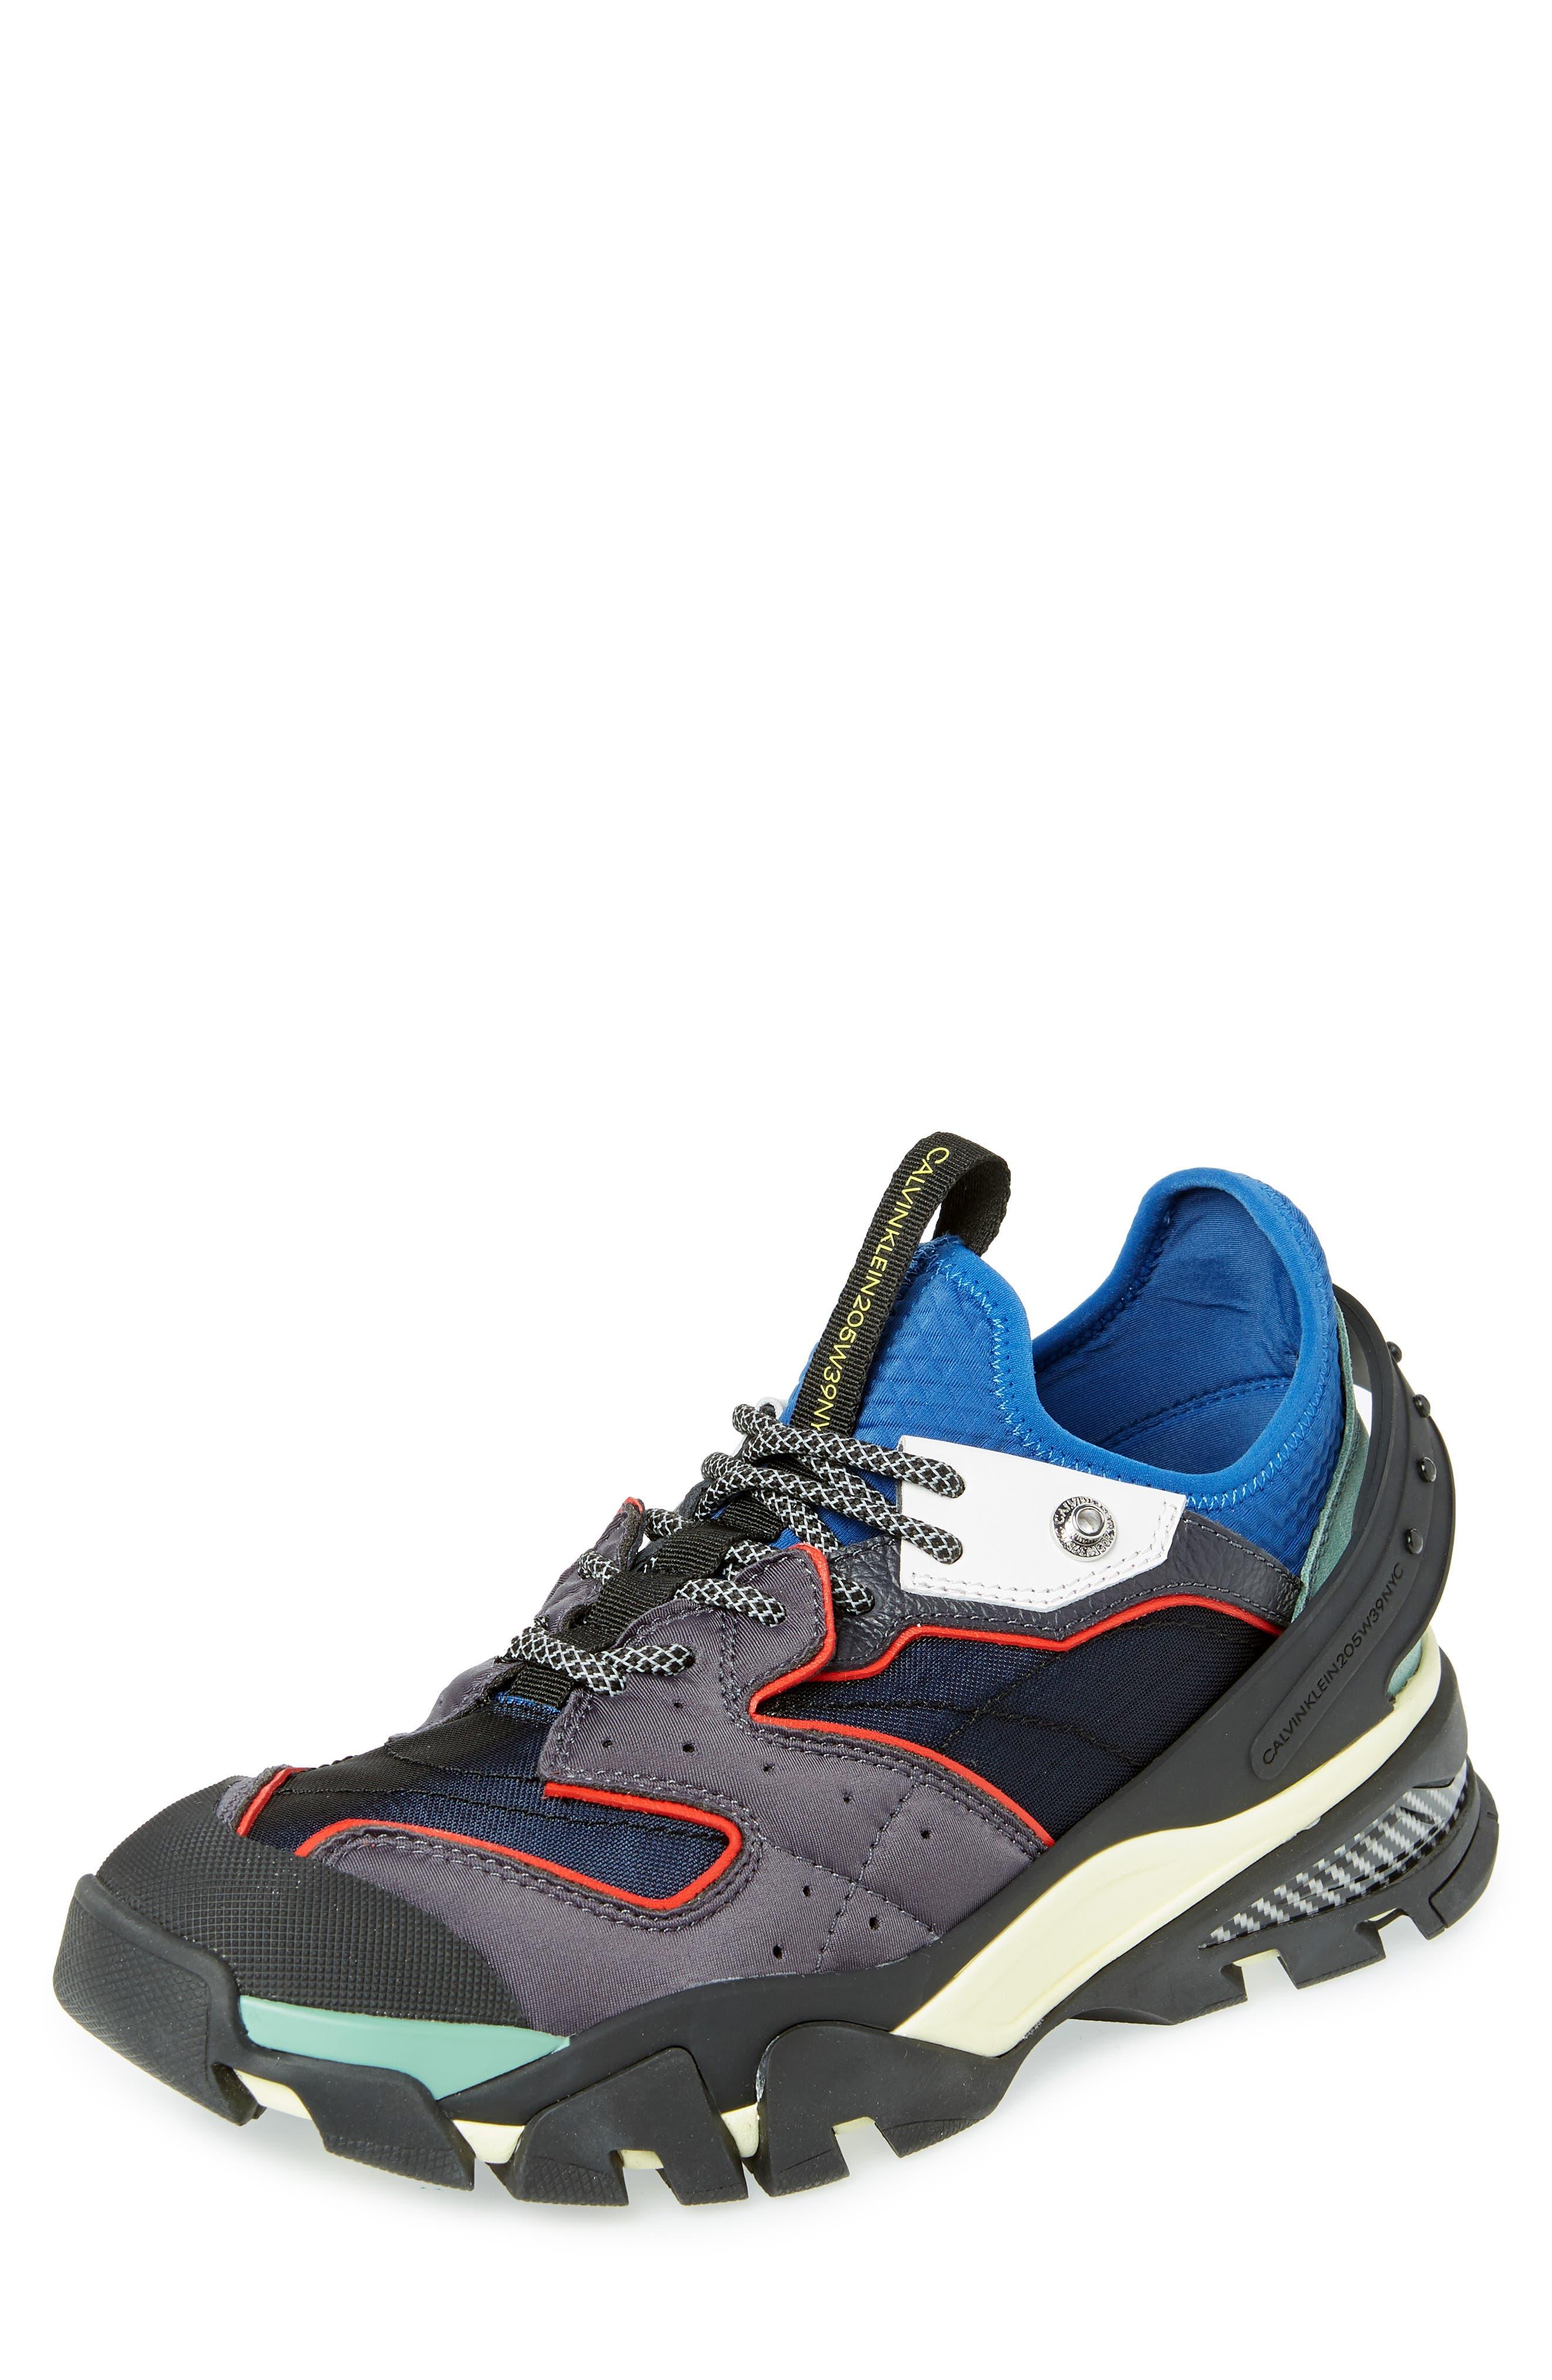 calvin klein runner sneakers